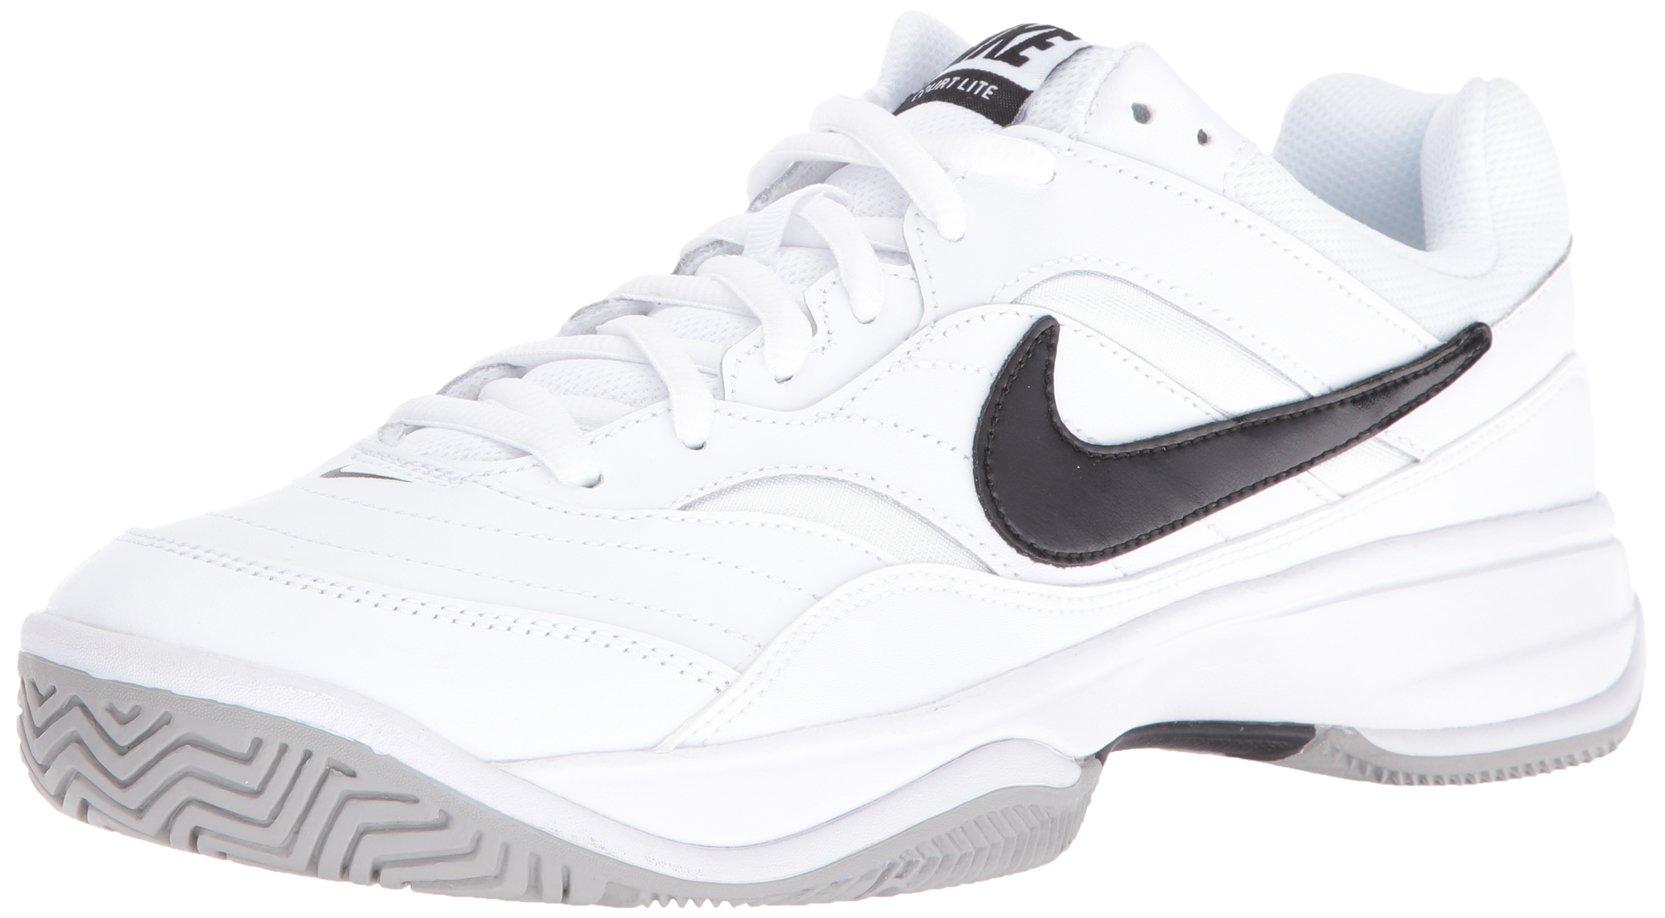 NIKE Men's Court Lite Tennis Shoe, White/Medium Grey/Black, 11.5 D(M) US by Nike